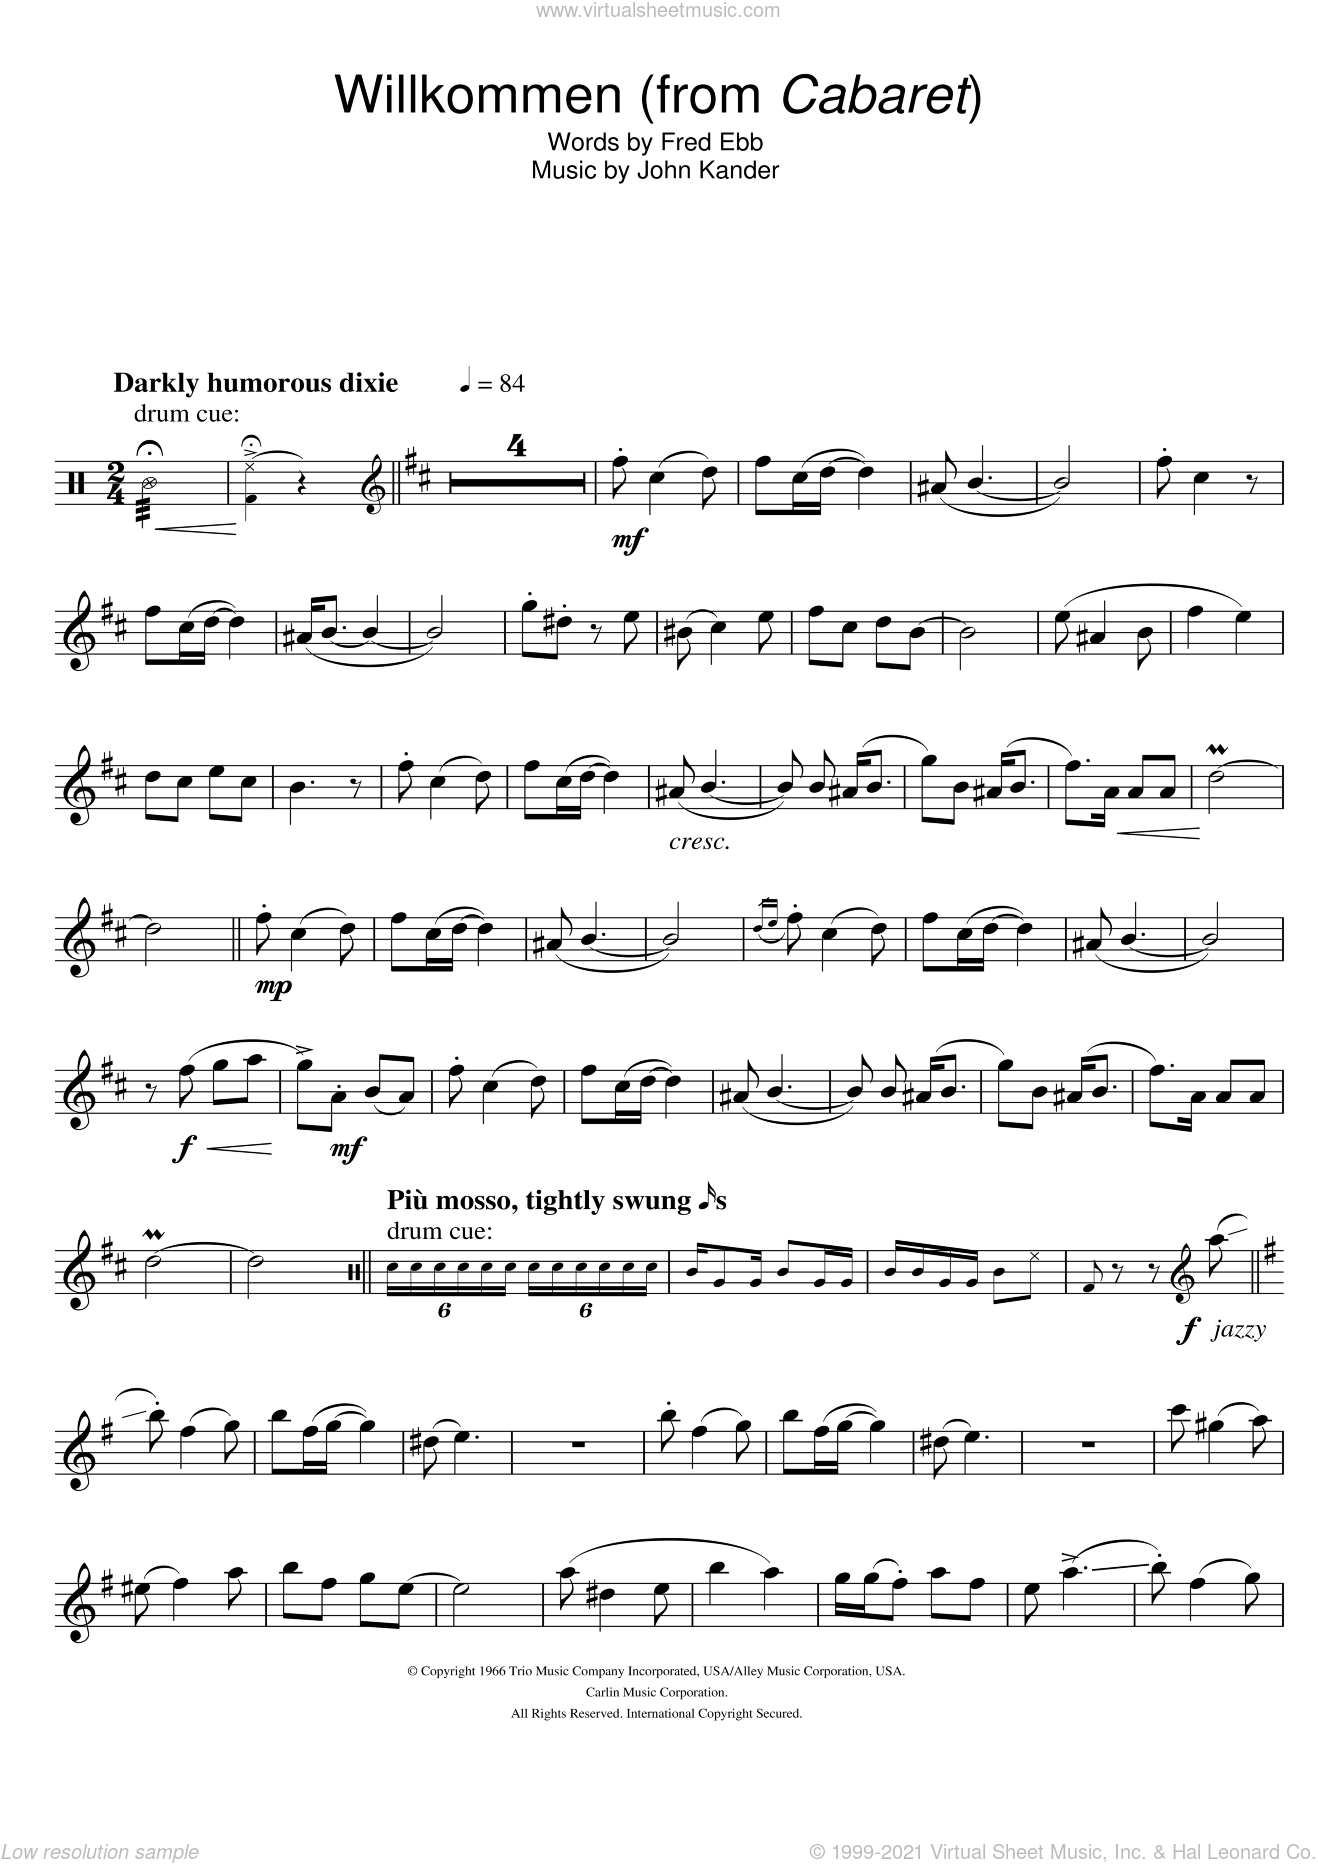 Willkommen (from Cabaret) sheet music for tenor saxophone solo by Kander & Ebb, Fred Ebb and John Kander, intermediate skill level